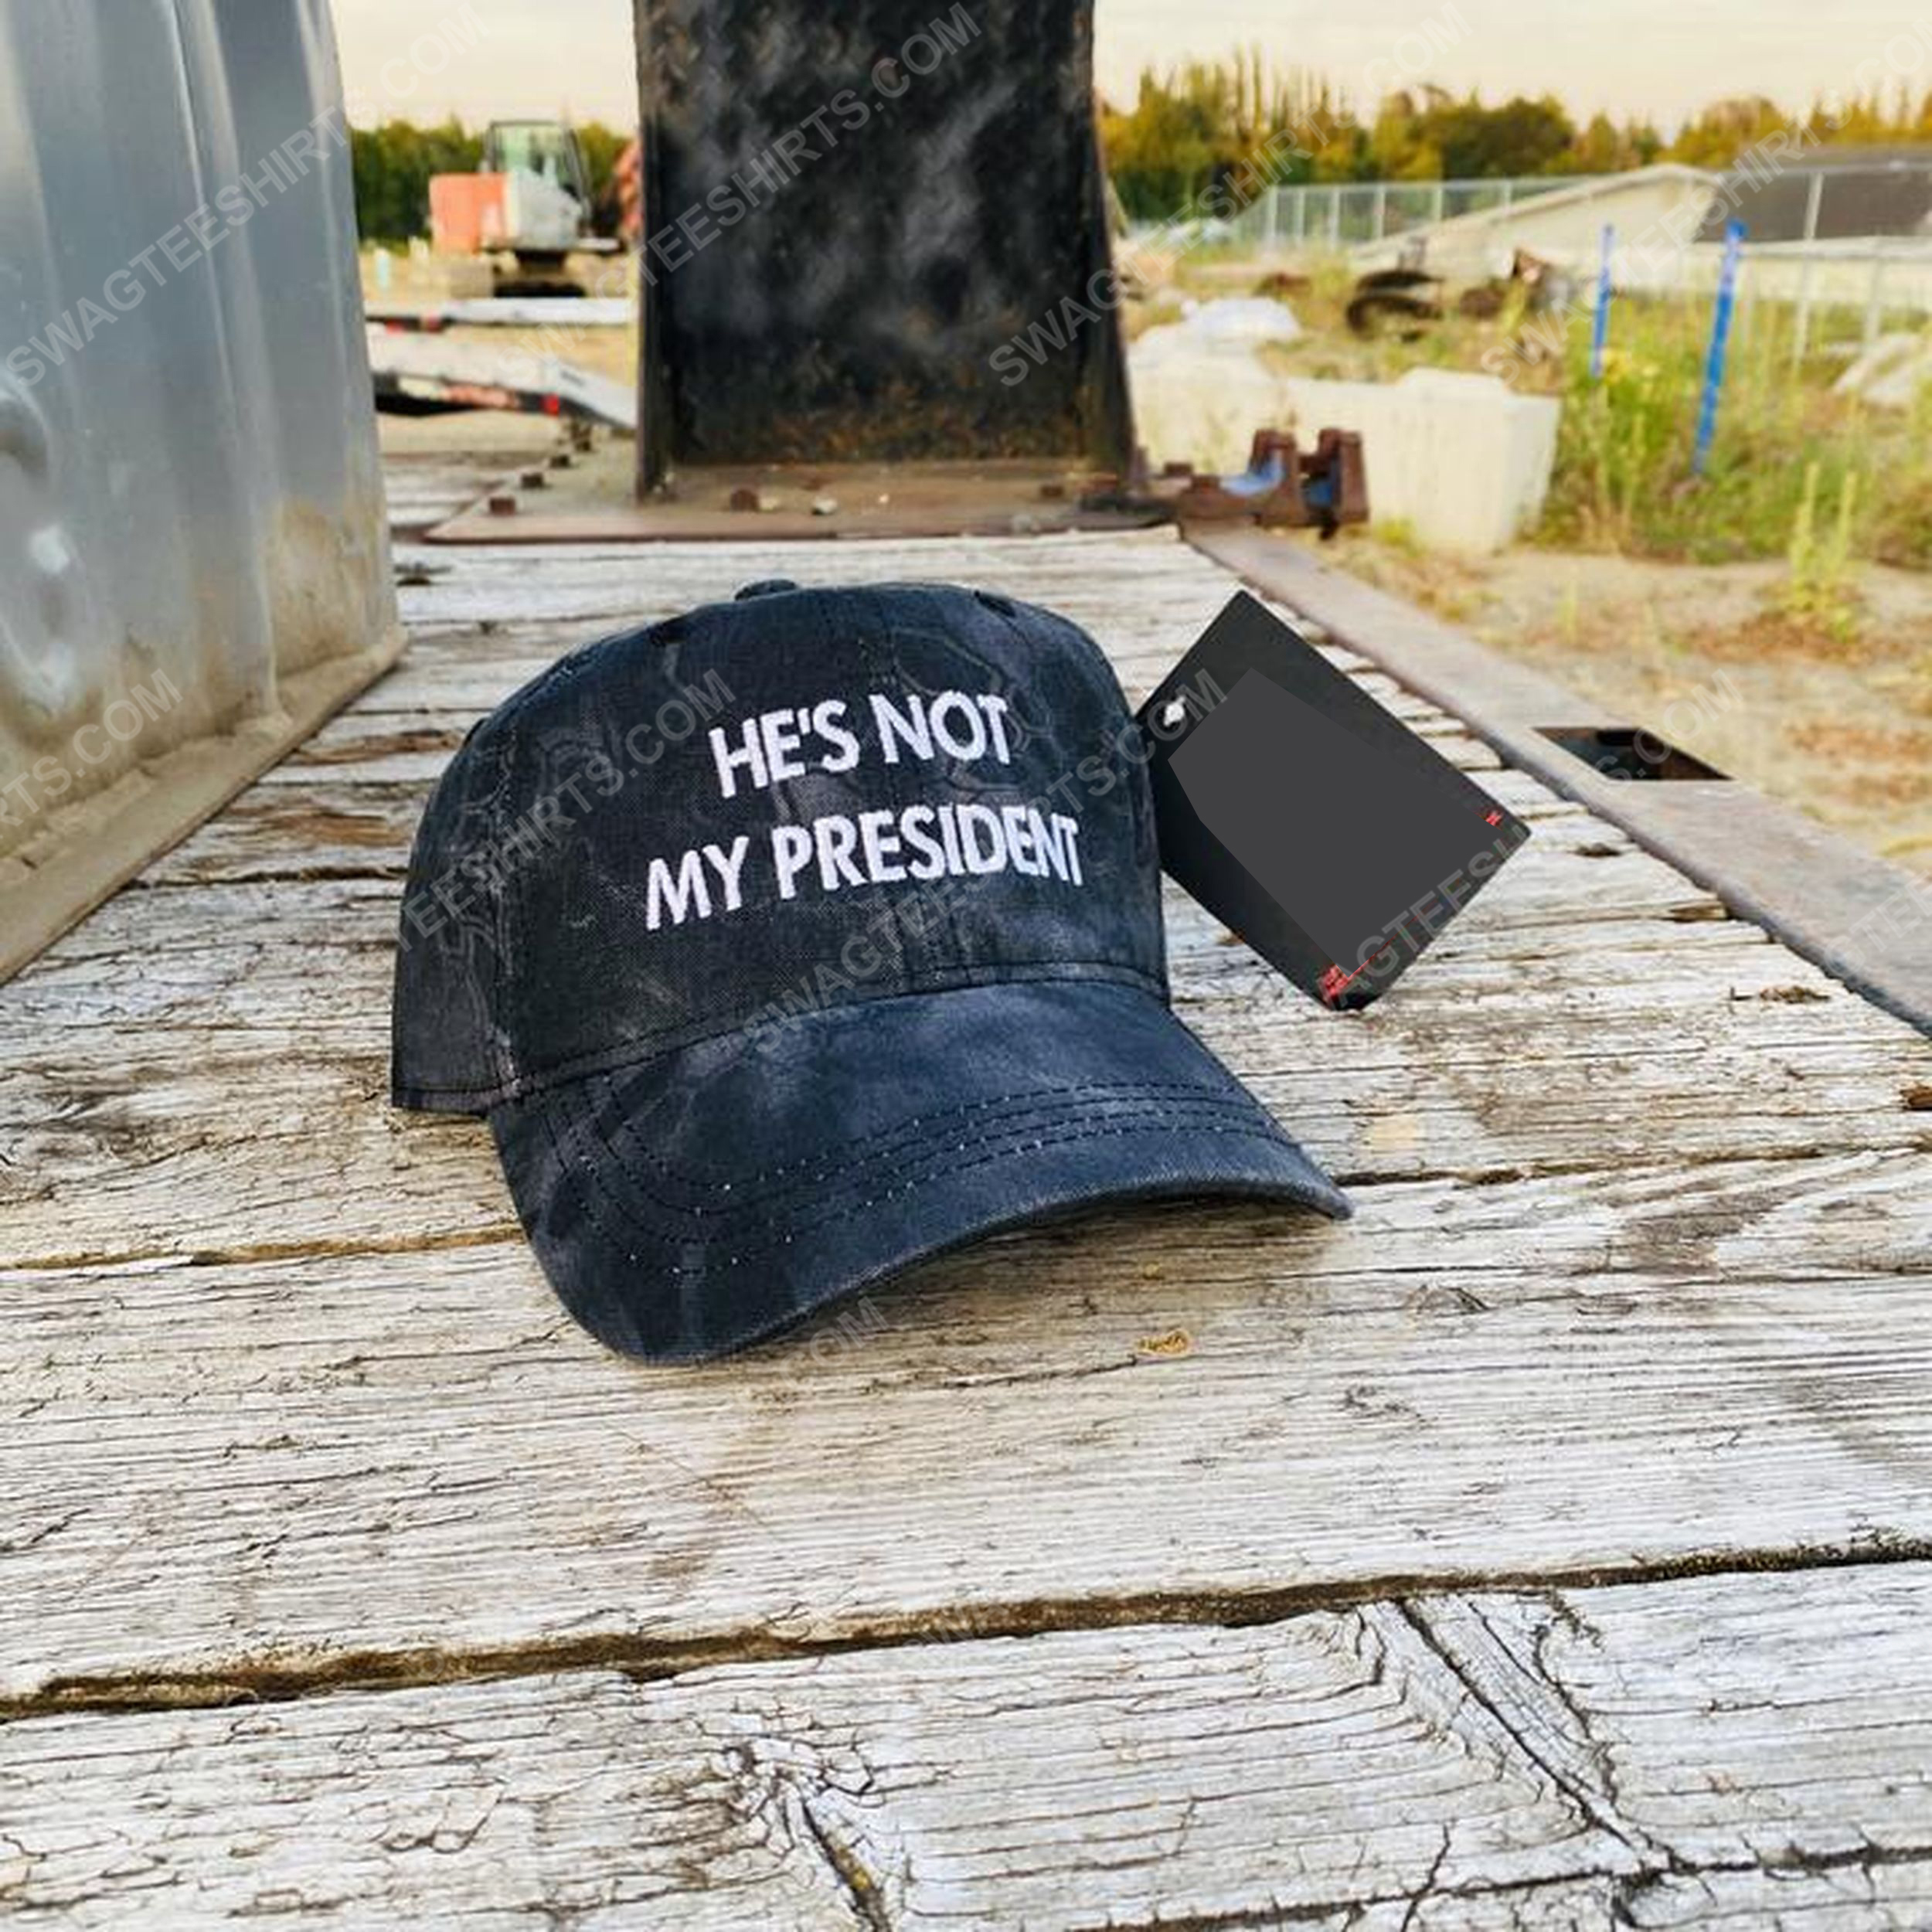 He's not my president full print classic hat 1 - Copy (2)